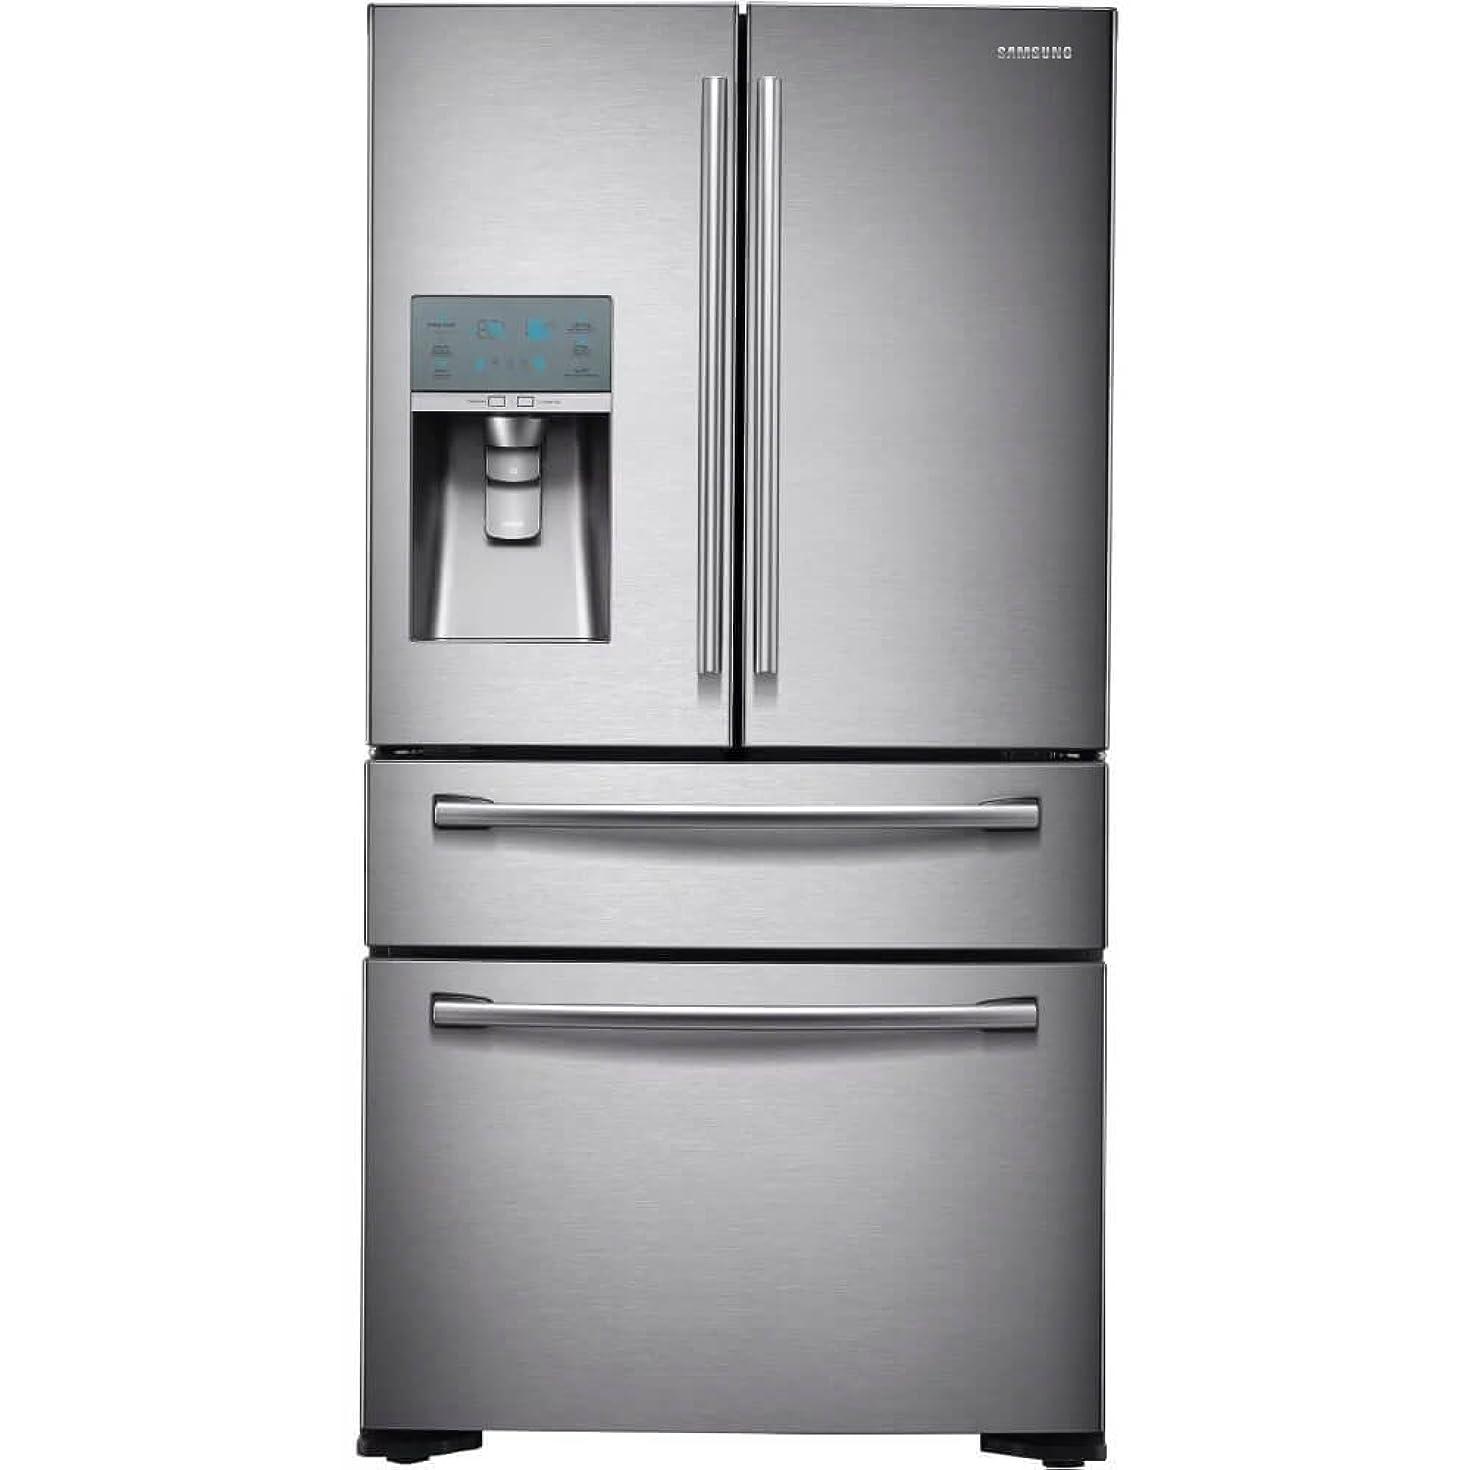 Samsung RF24FSEDBSR Stainless Steel Counter Depth 4-Door Refrigerator, 24 Cubic Feet